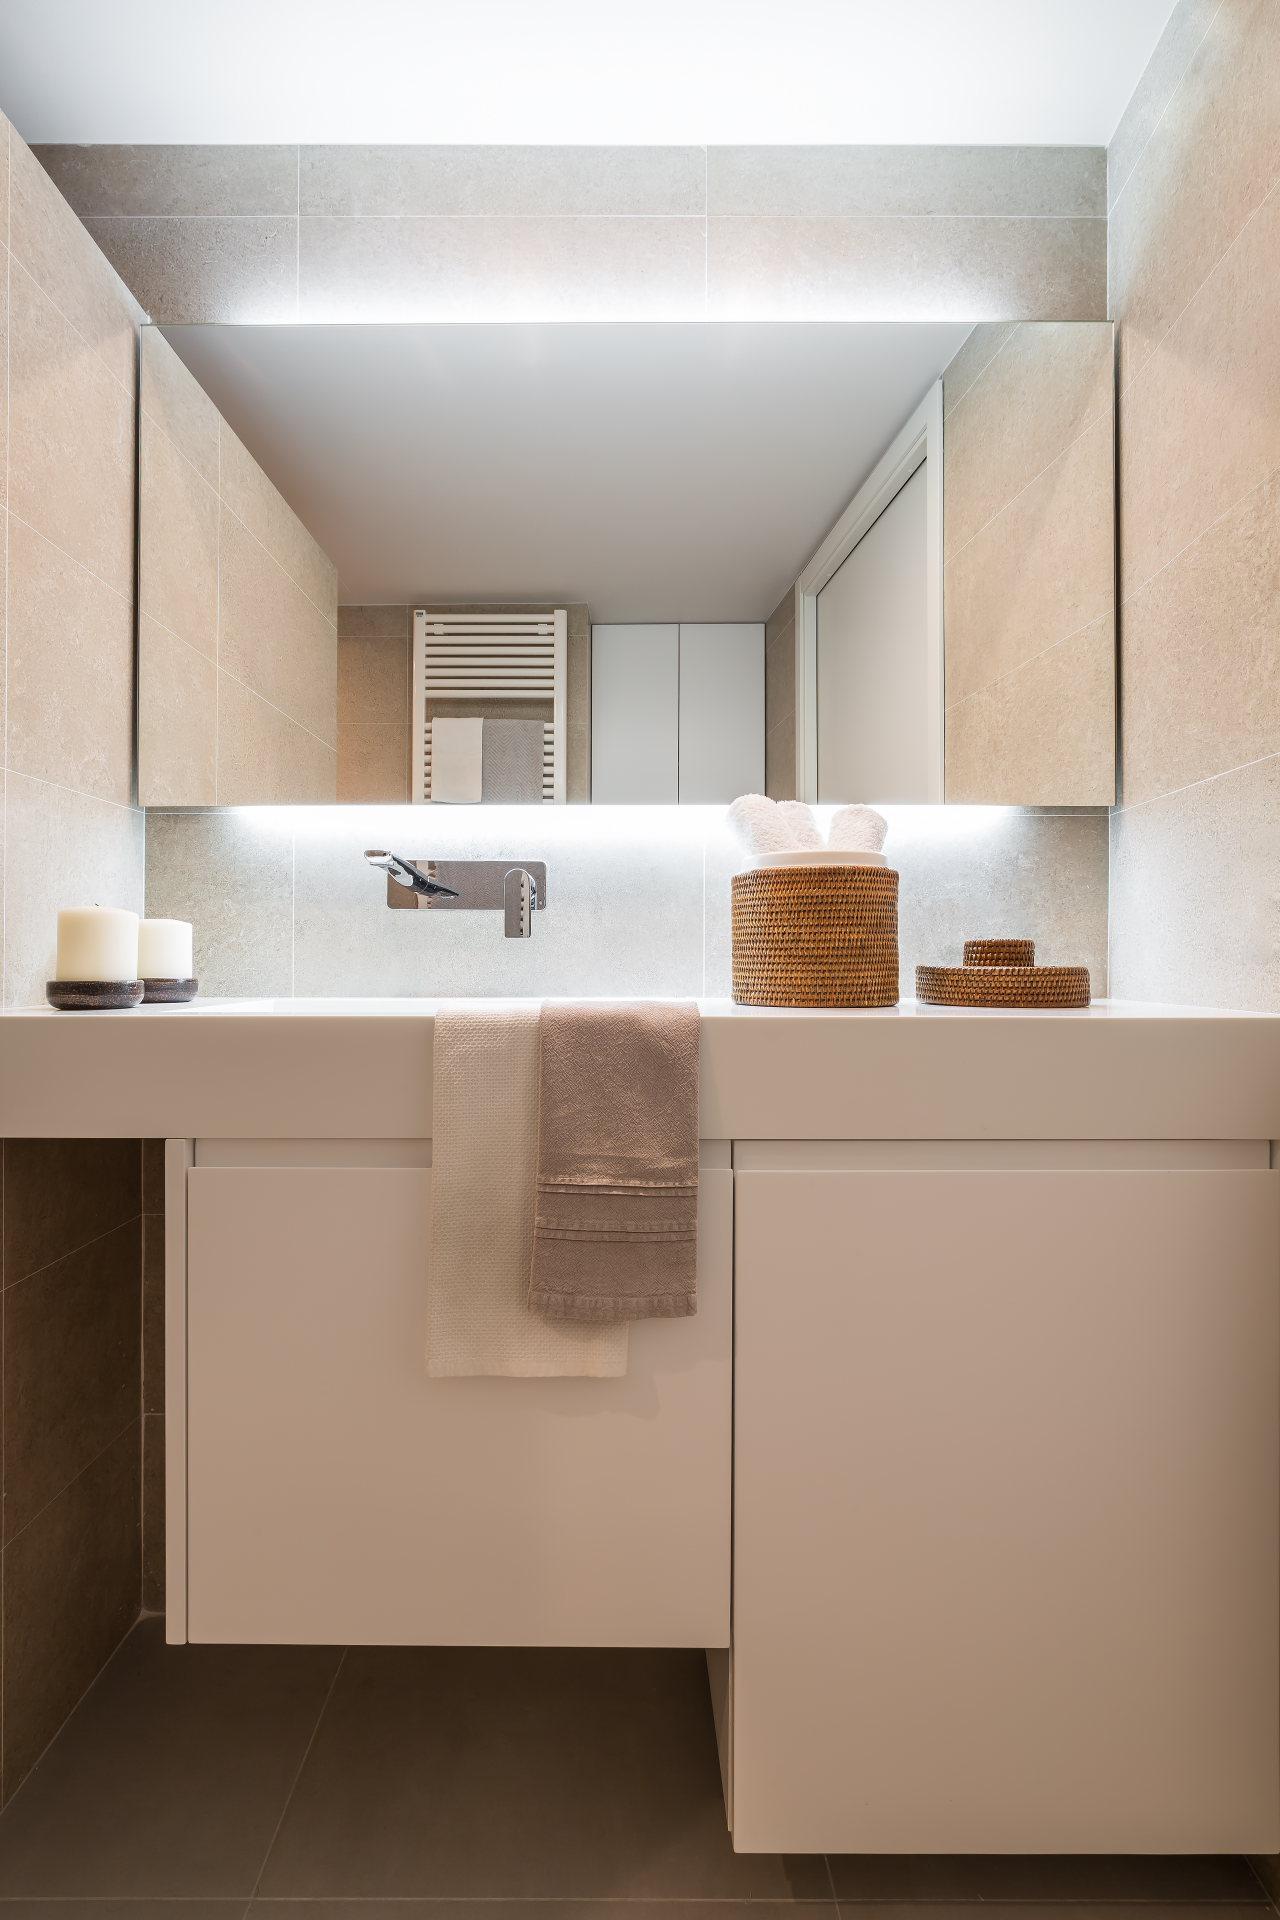 fotografia-arquitectura-interiorismo-valencia-fenollar-german-cabo-laura-yerpes (12)